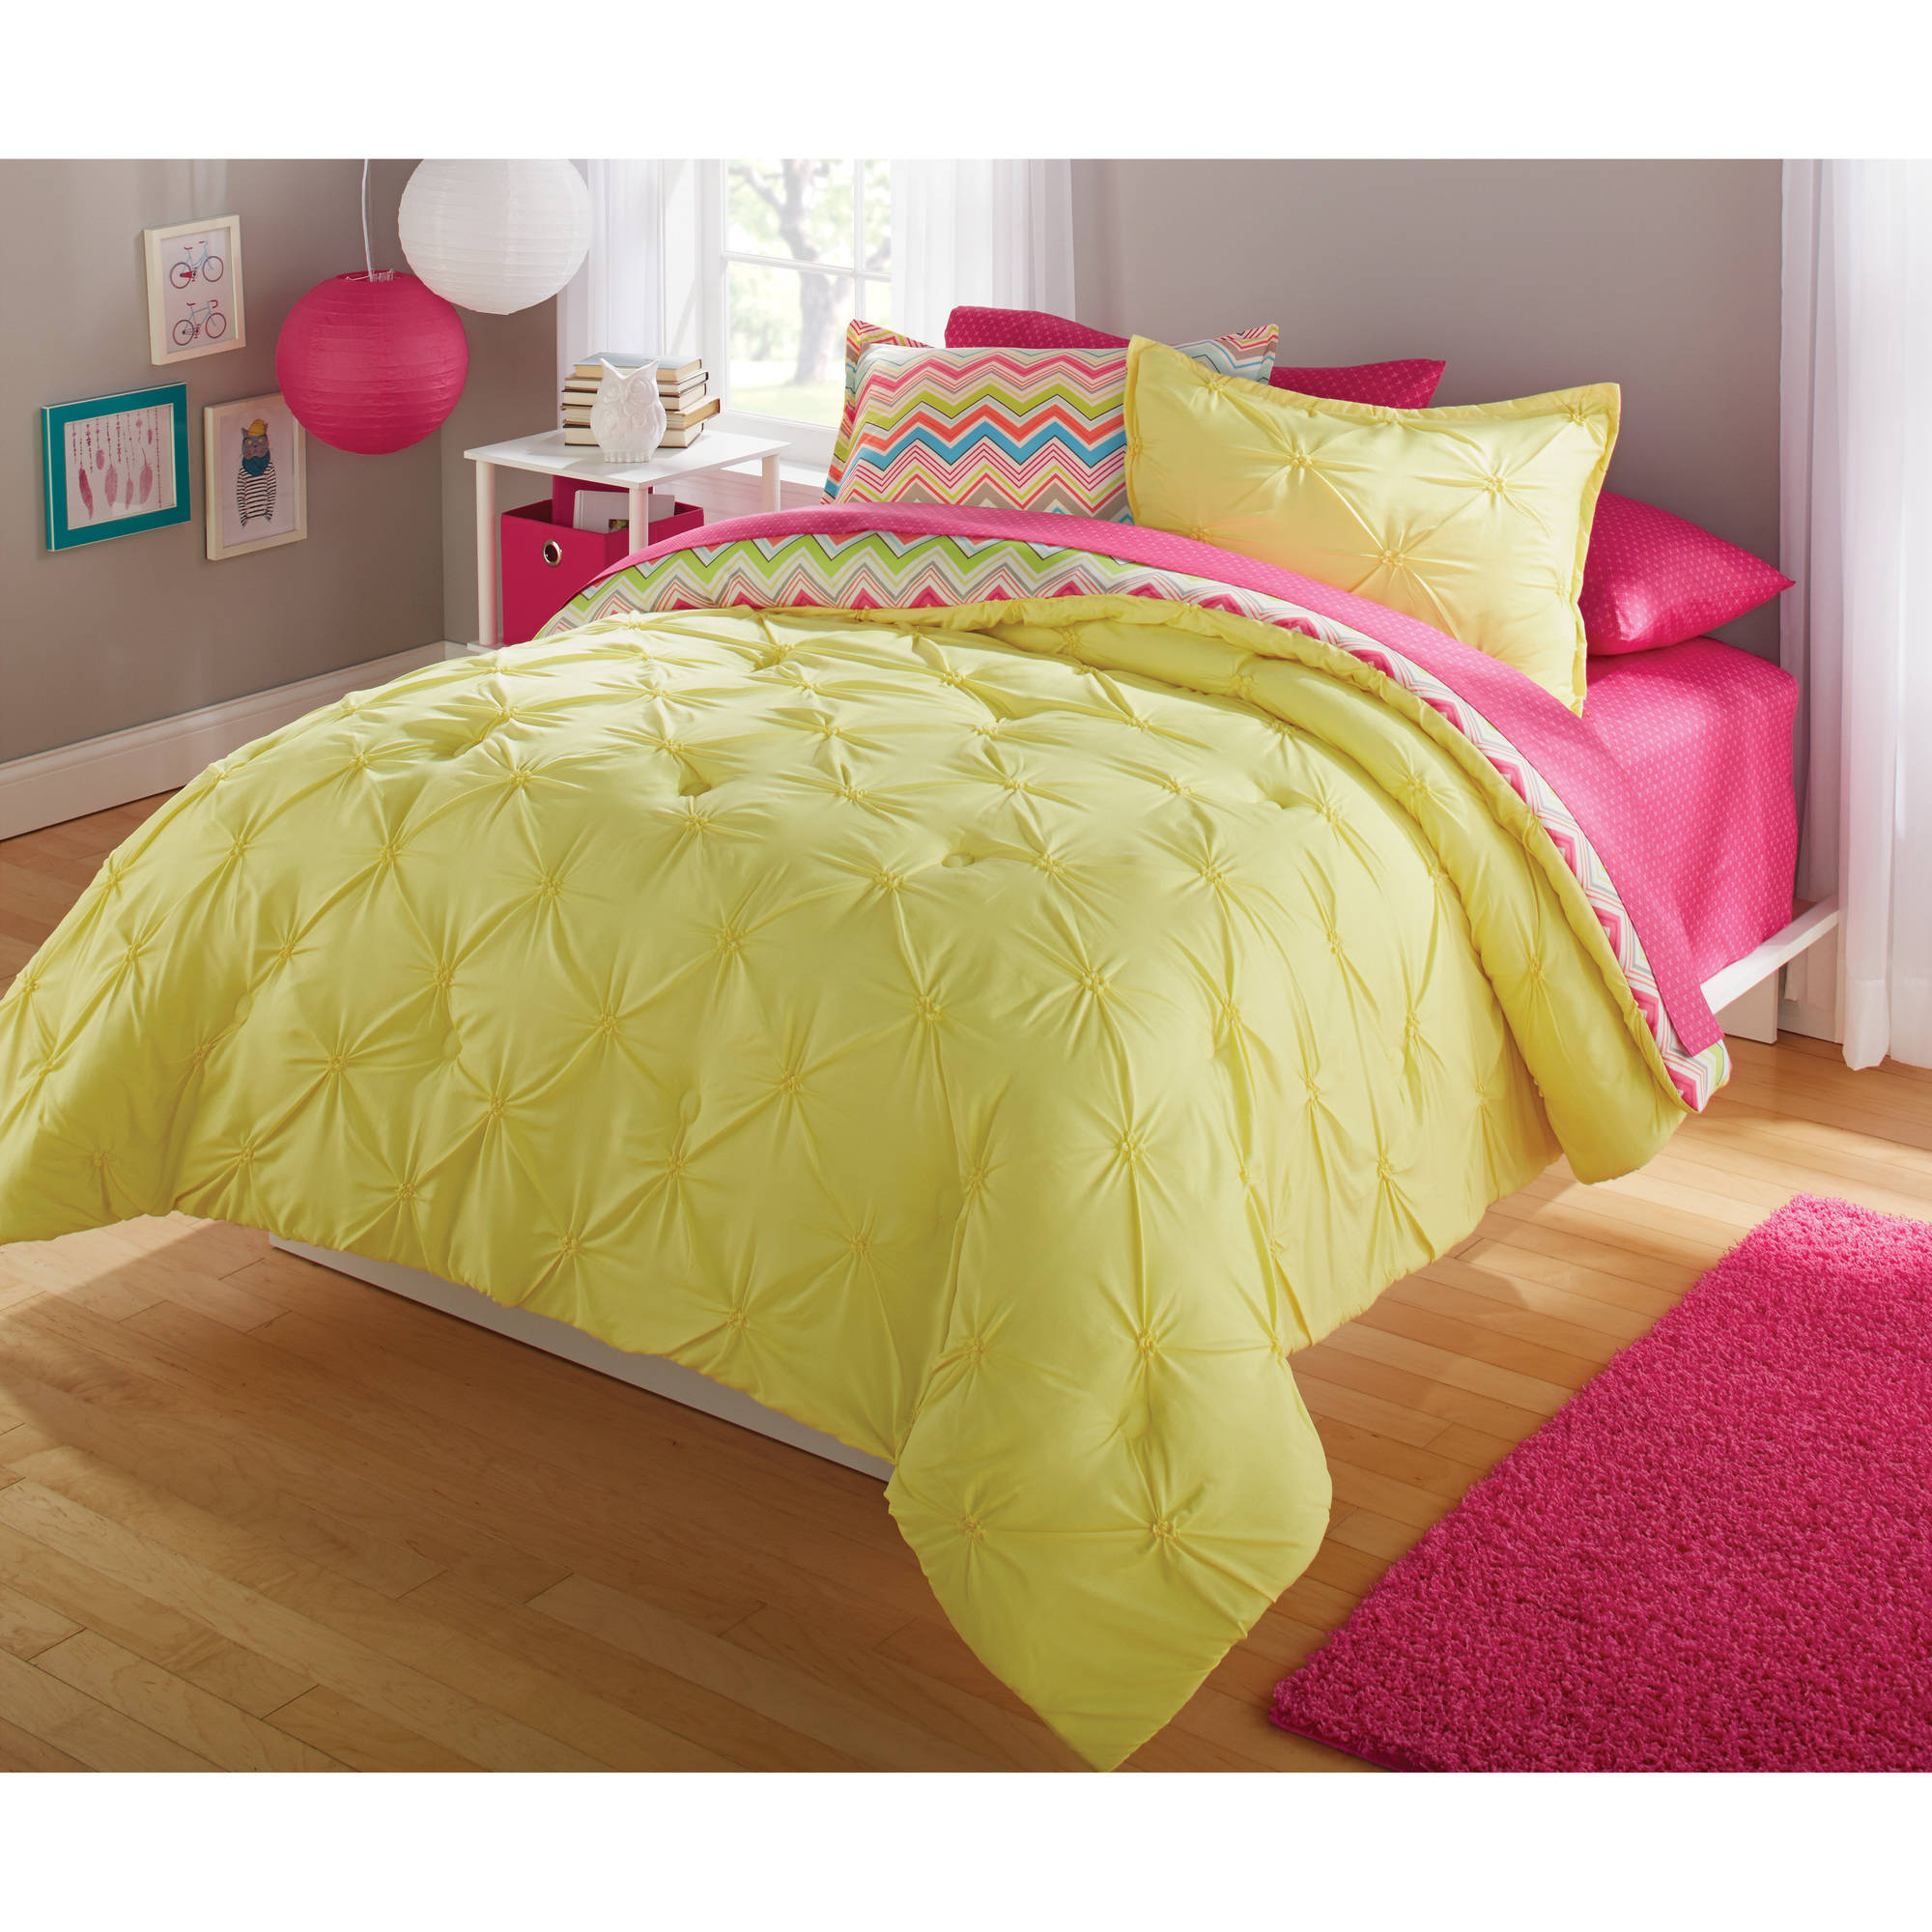 Your Zone Bedding Comforter Set Bright Chevron Walmart Com